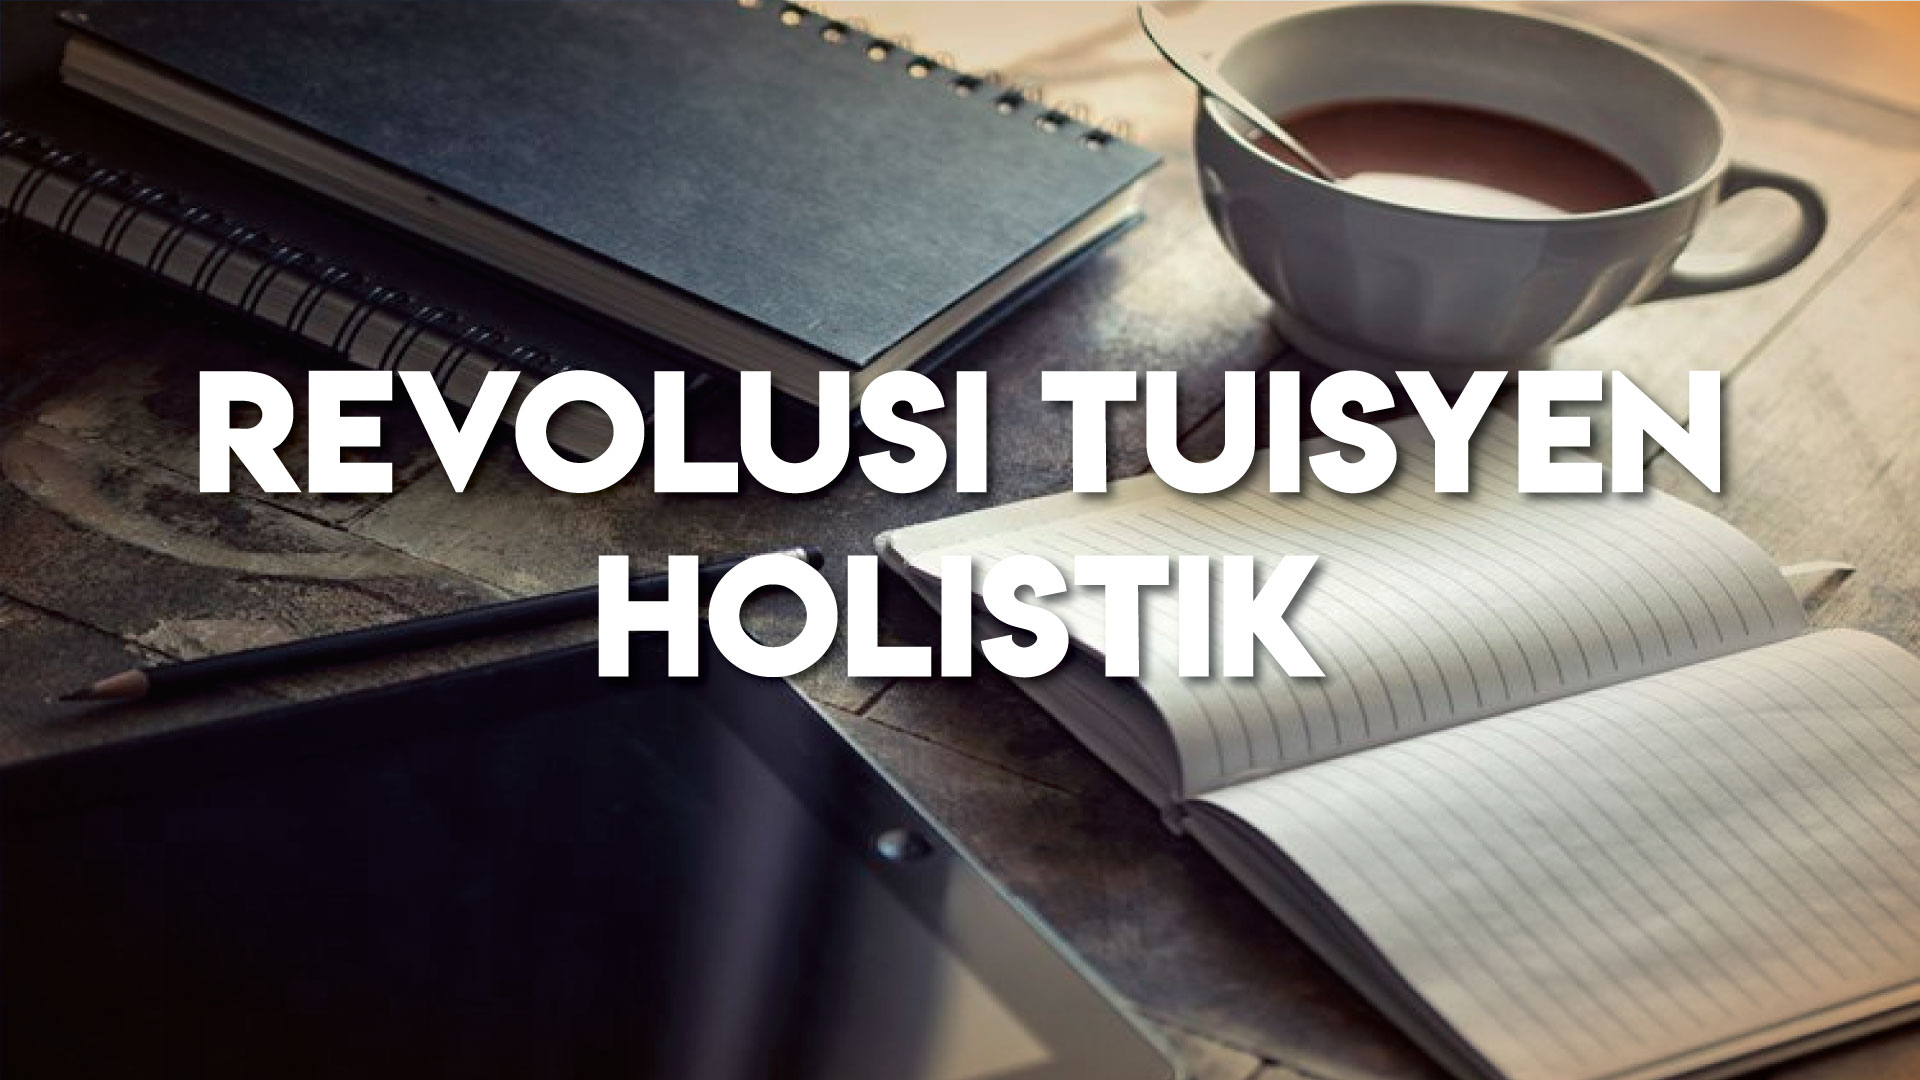 revolusi tuisyen holistik